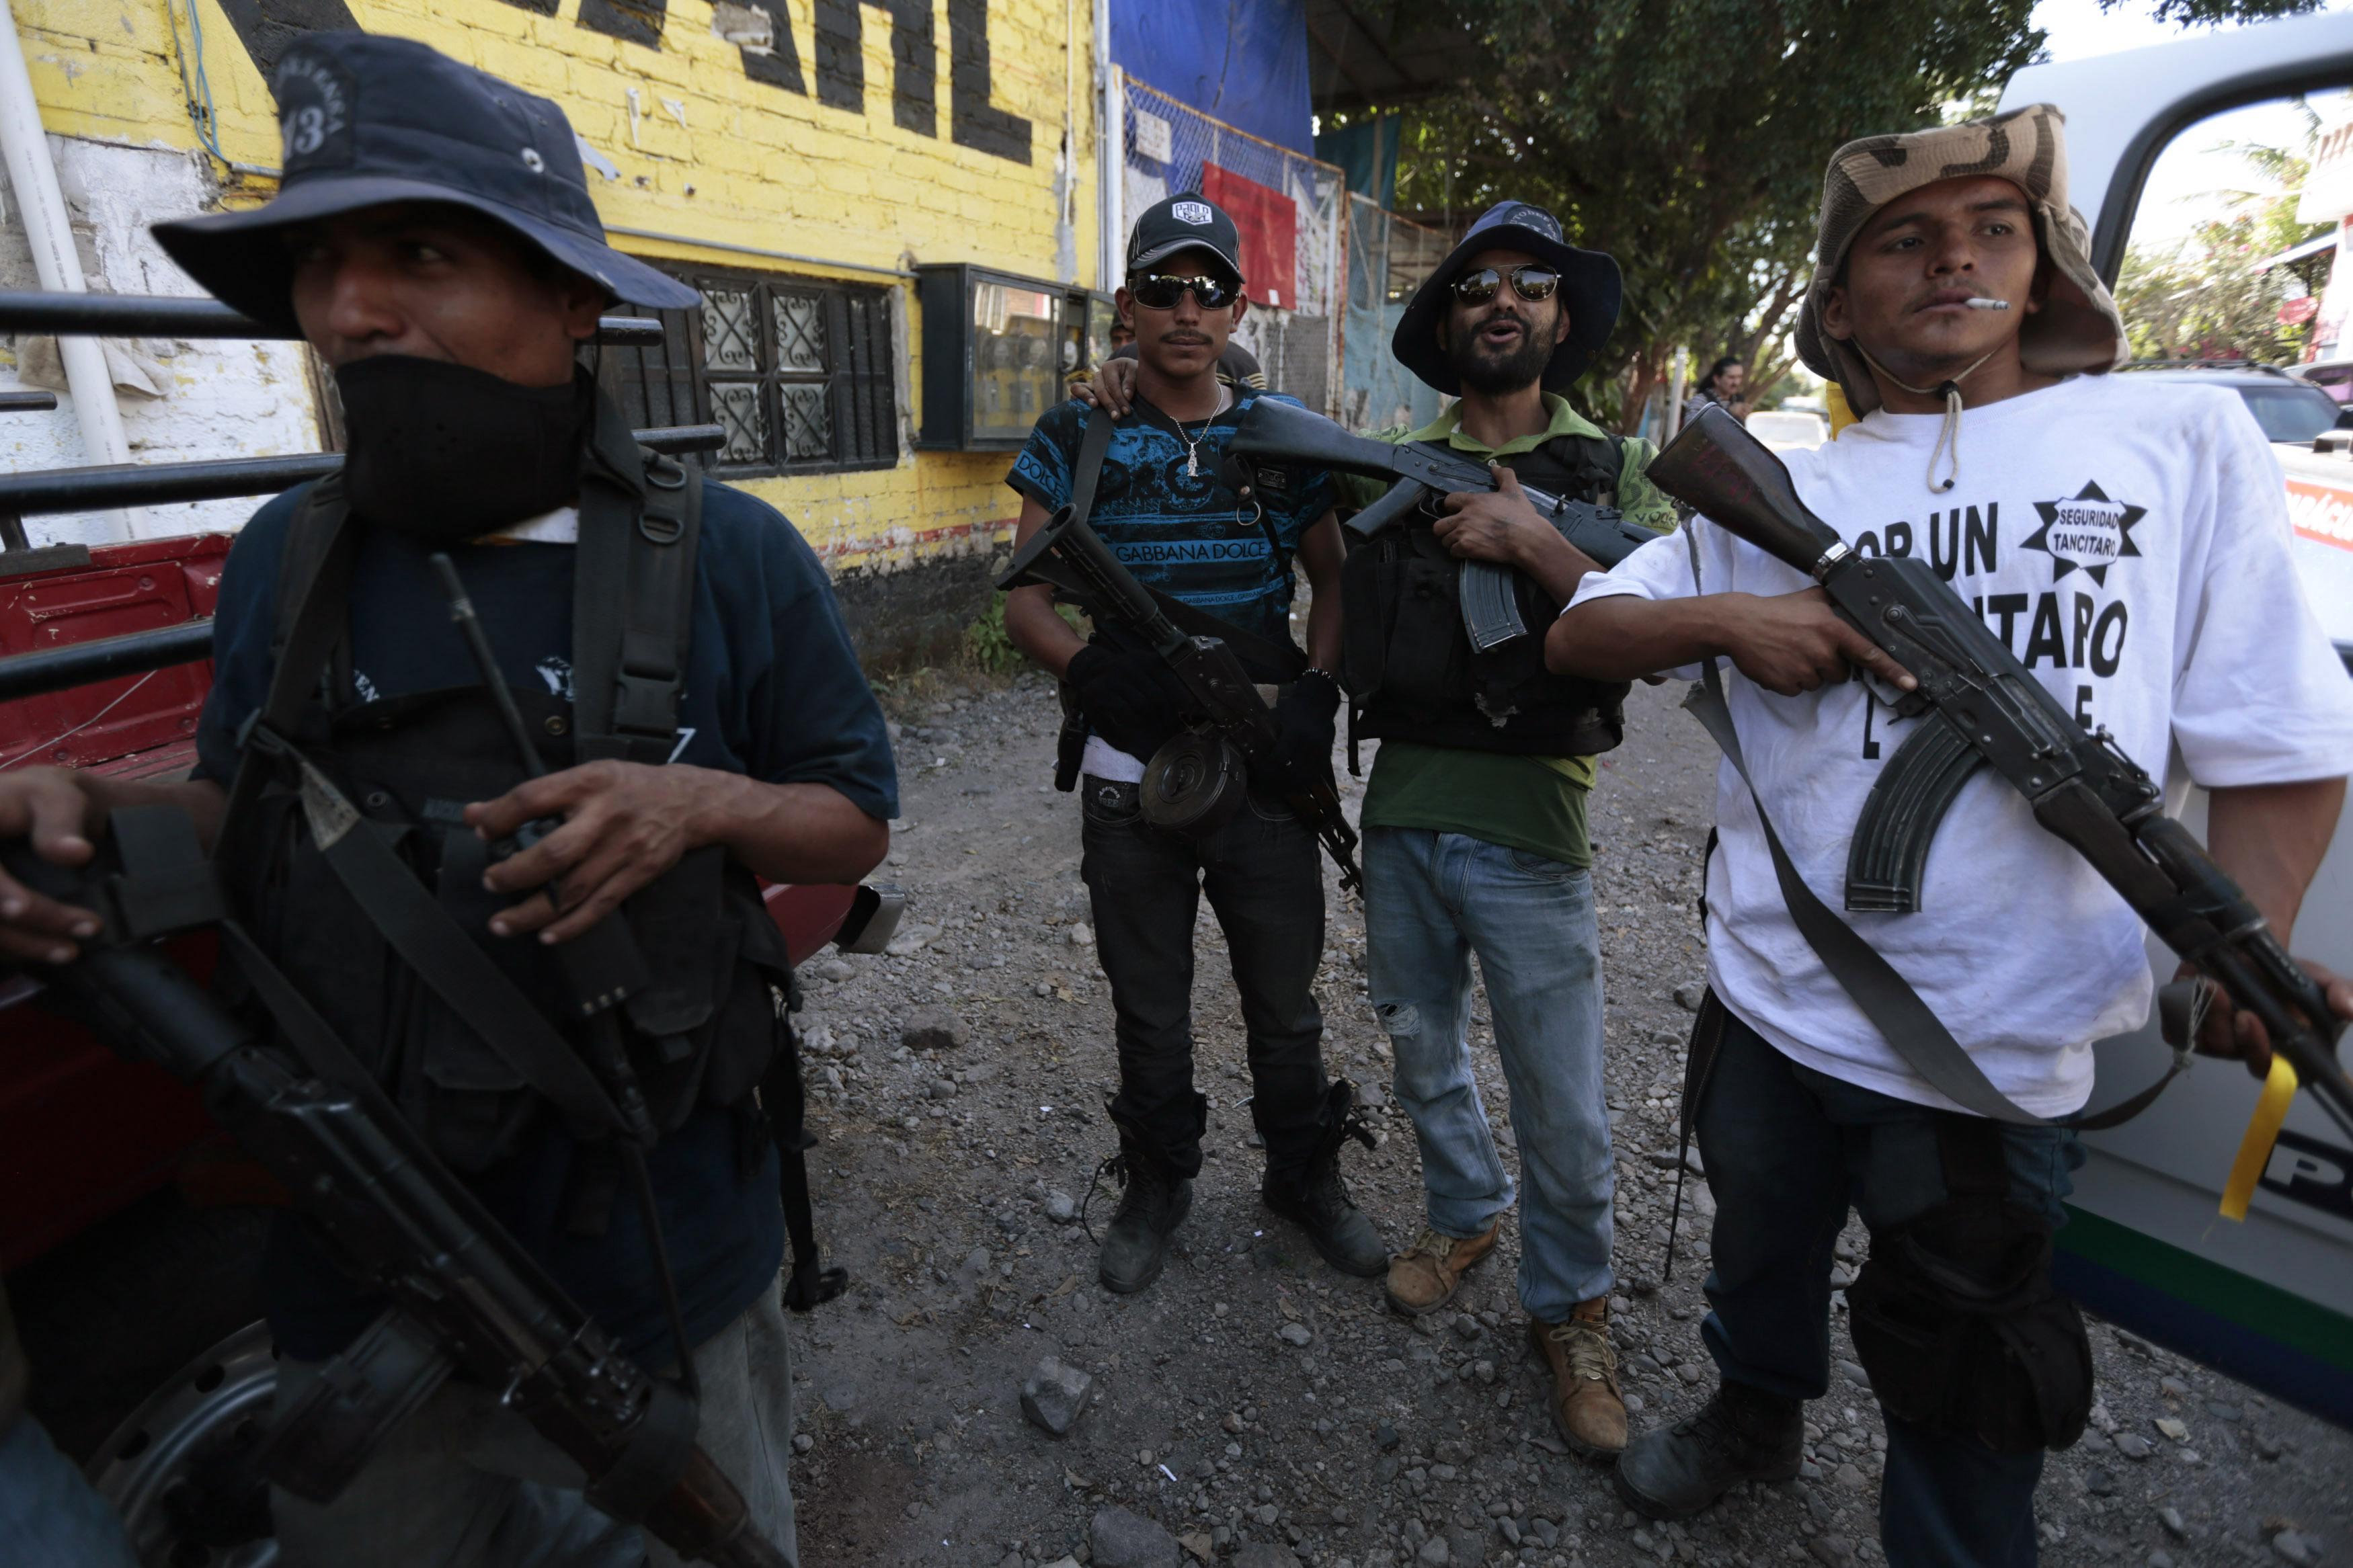 Mexico legalizes vigilantes, nabs cartel leader